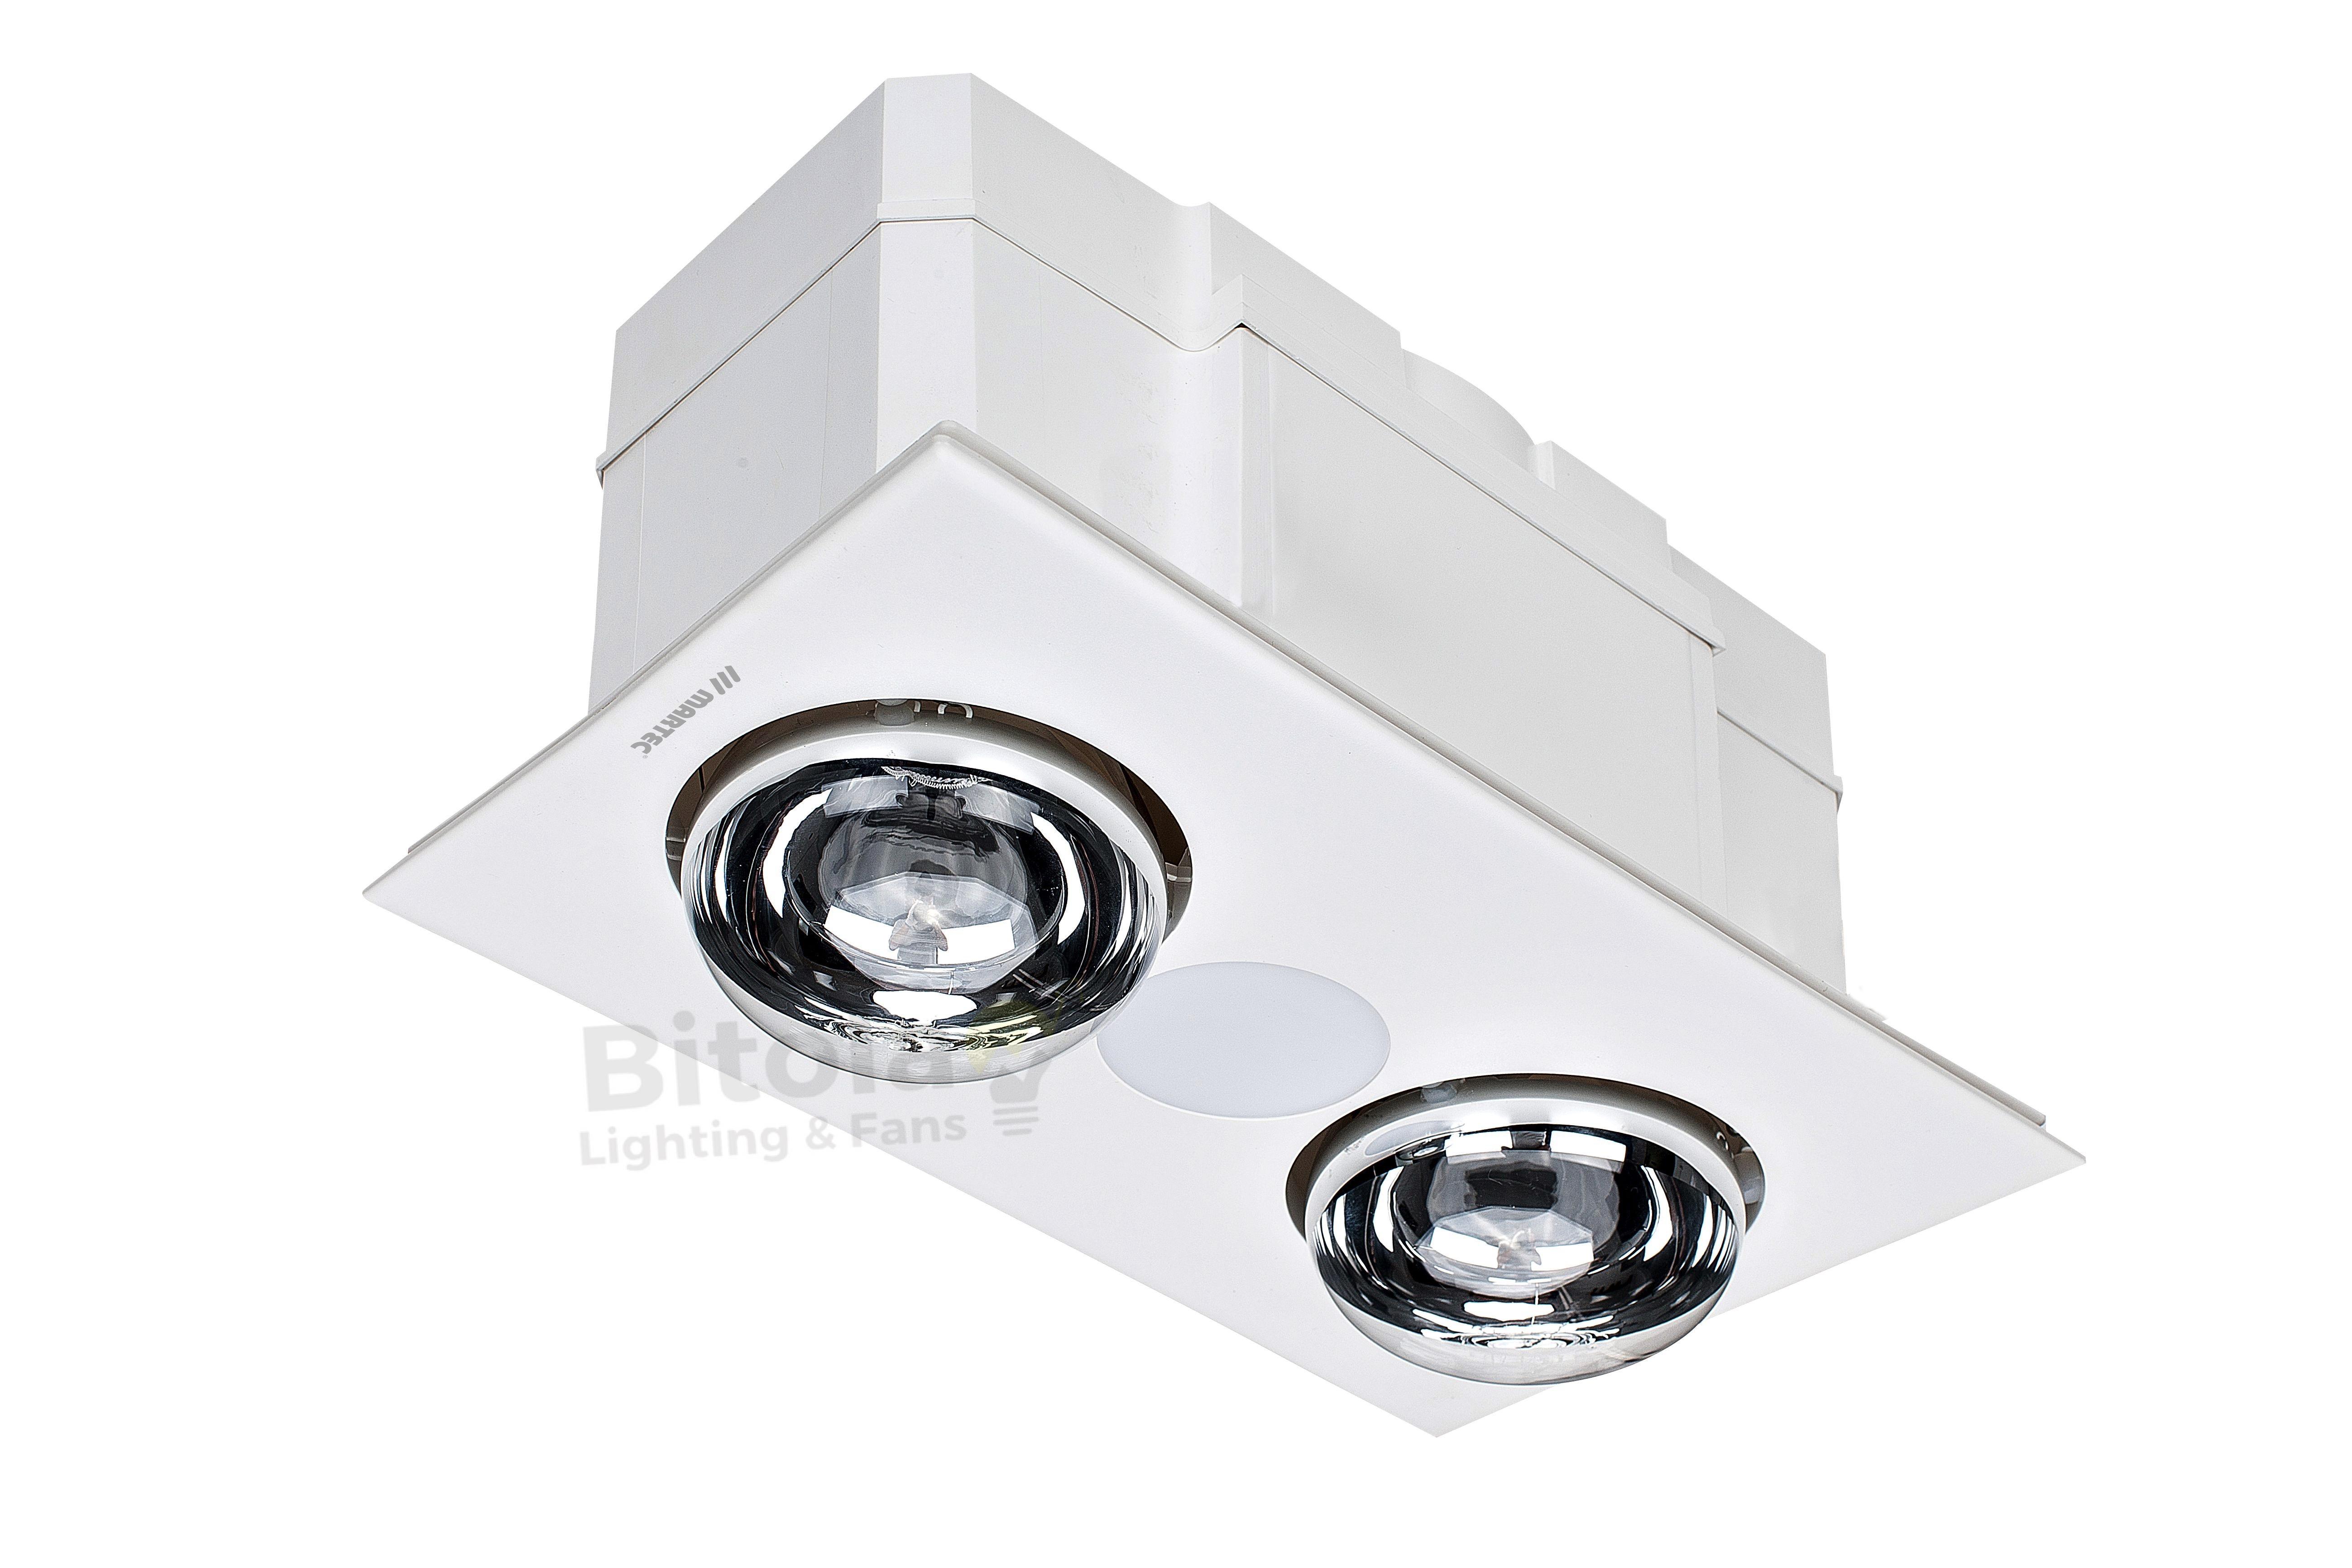 3 In 1 Heater Lights Bathroom Home Designs Inspiration